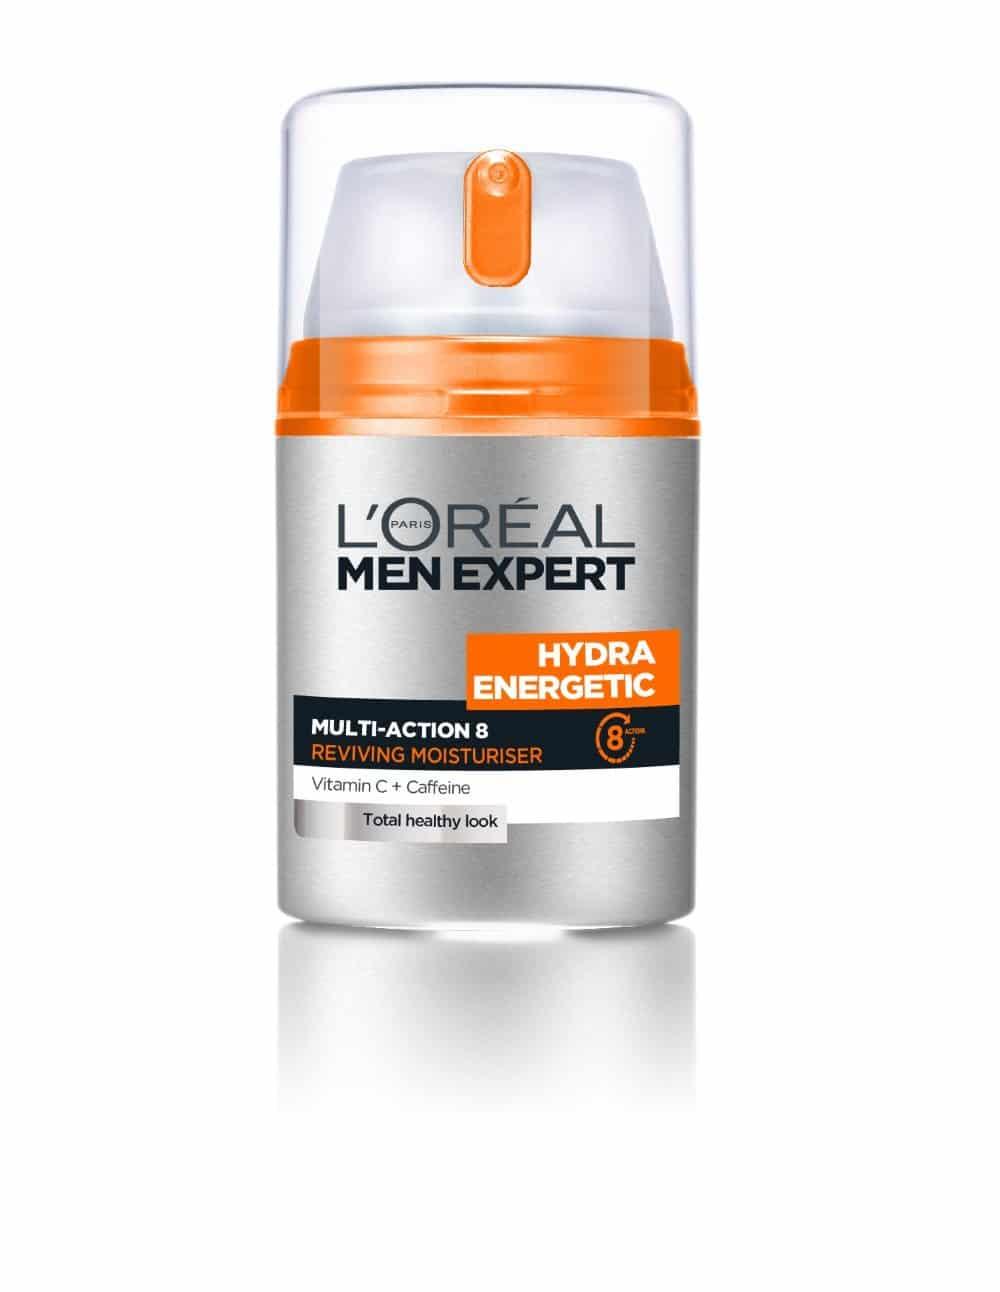 LOreal-Paris-Men-Expert-Hydra-Energetic-Multi-Action-Moisturizer.